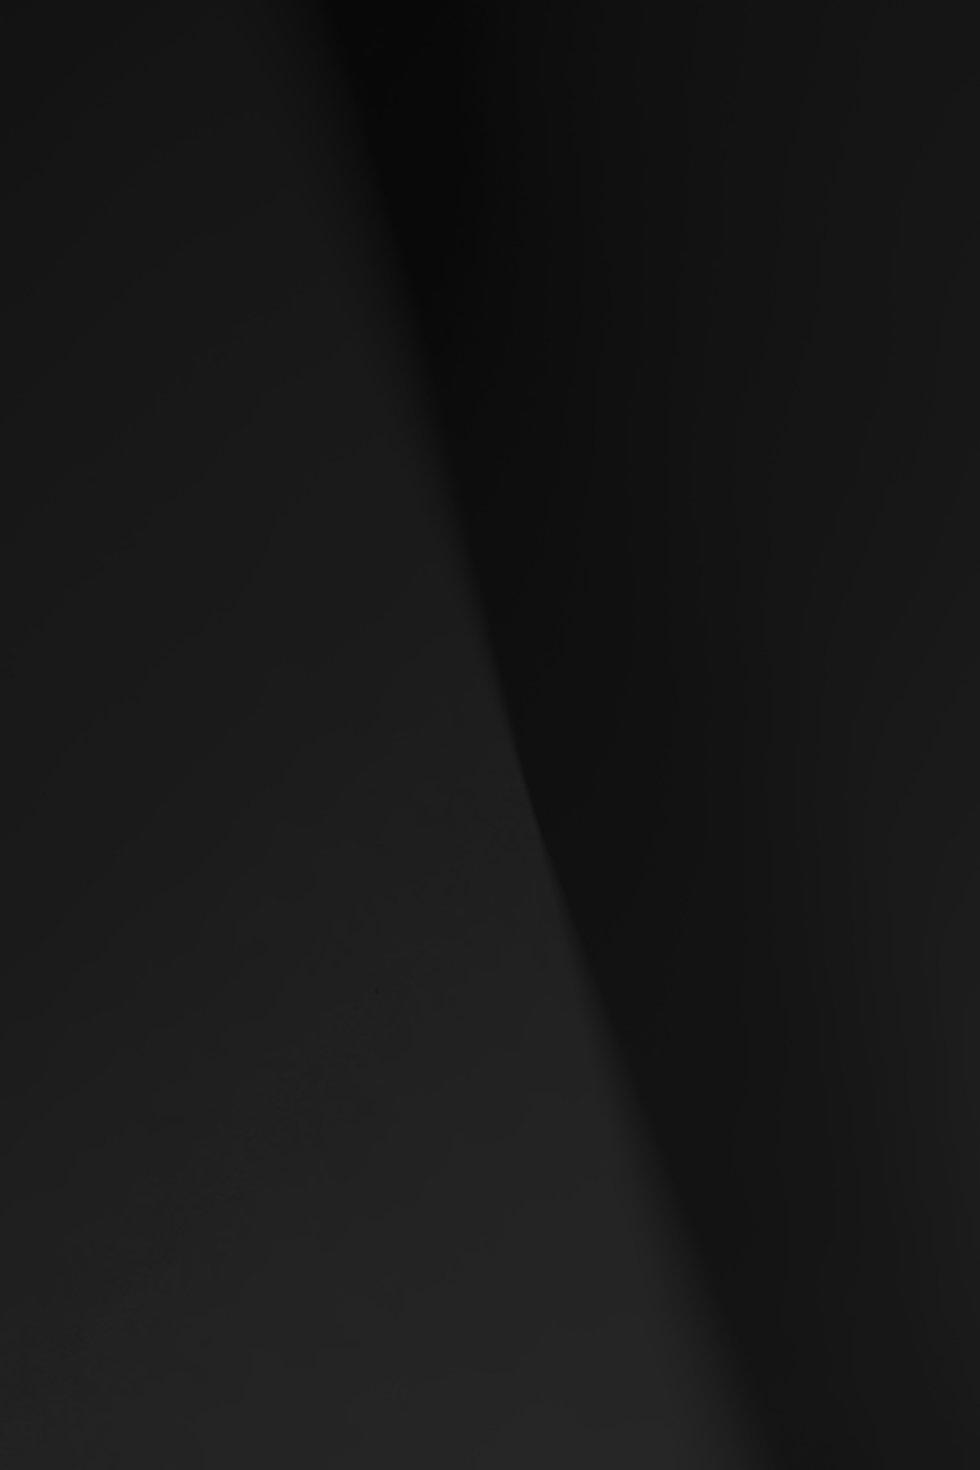 pexels-karolina-grabowska-4040651_edited_edited.jpg